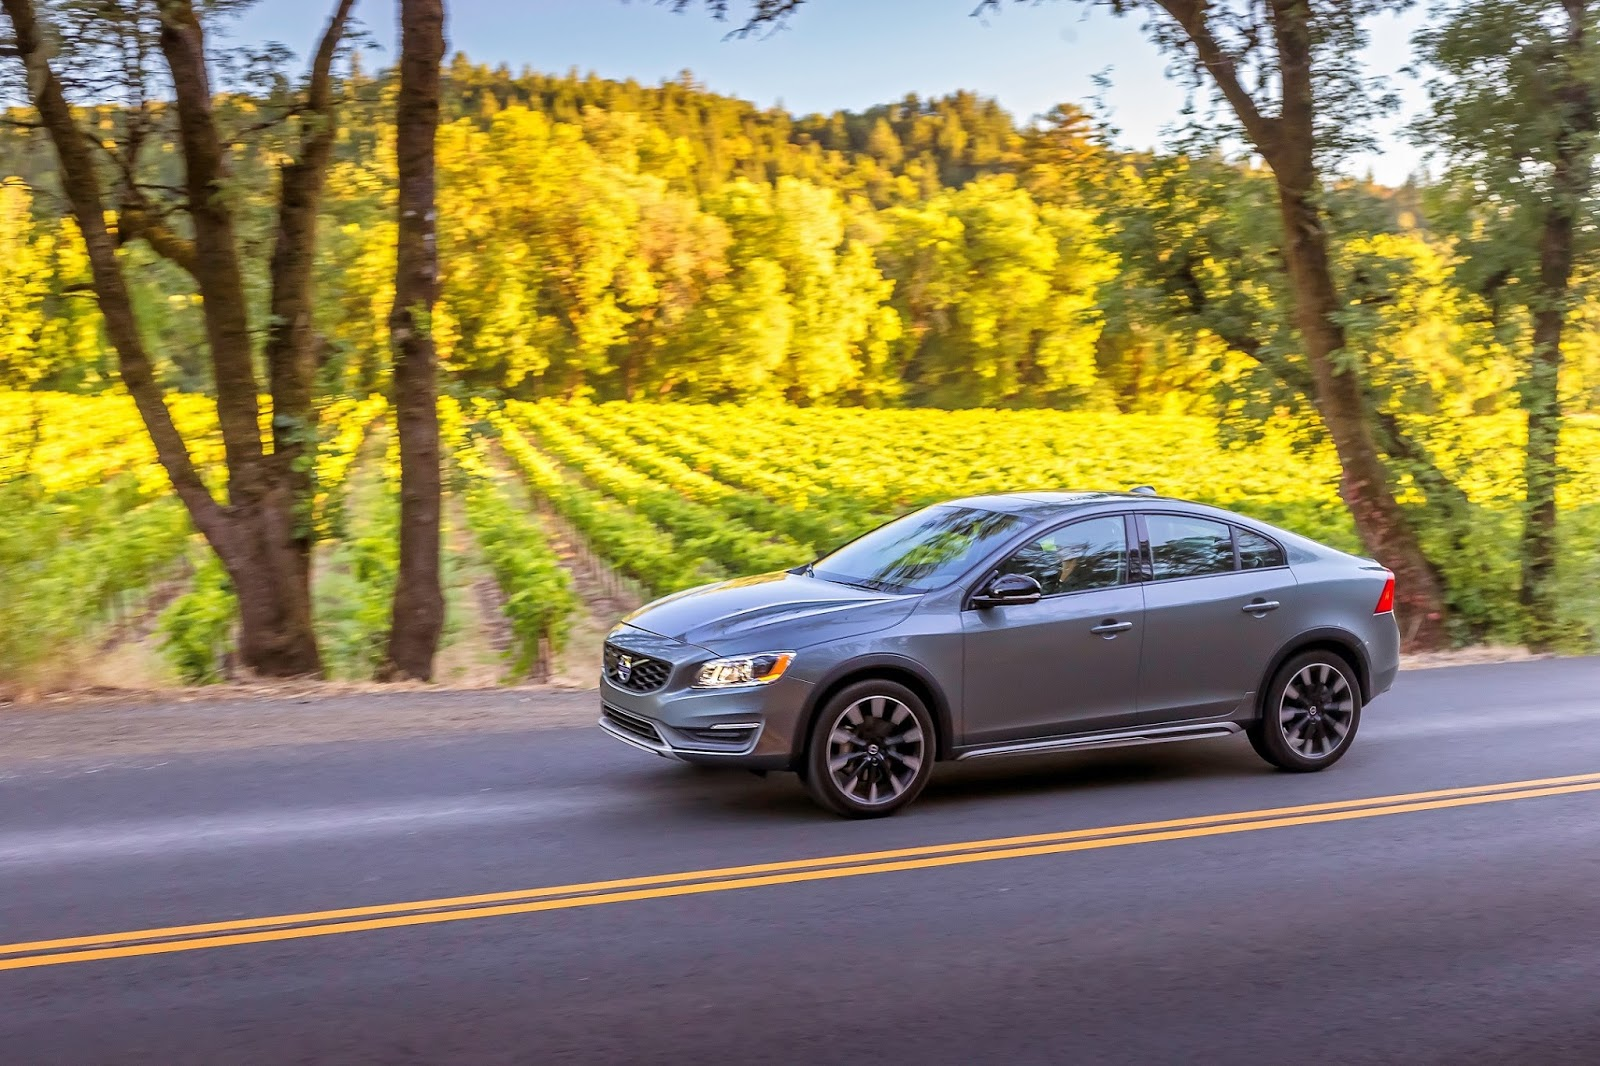 VOLVO%2BS60%2BCROSS%2BCOUNTRY%2B5 Η Volvo με το νέο S60 Cross Country δημιουργεί το πρώτο sedan με διττό χαρακτήρα